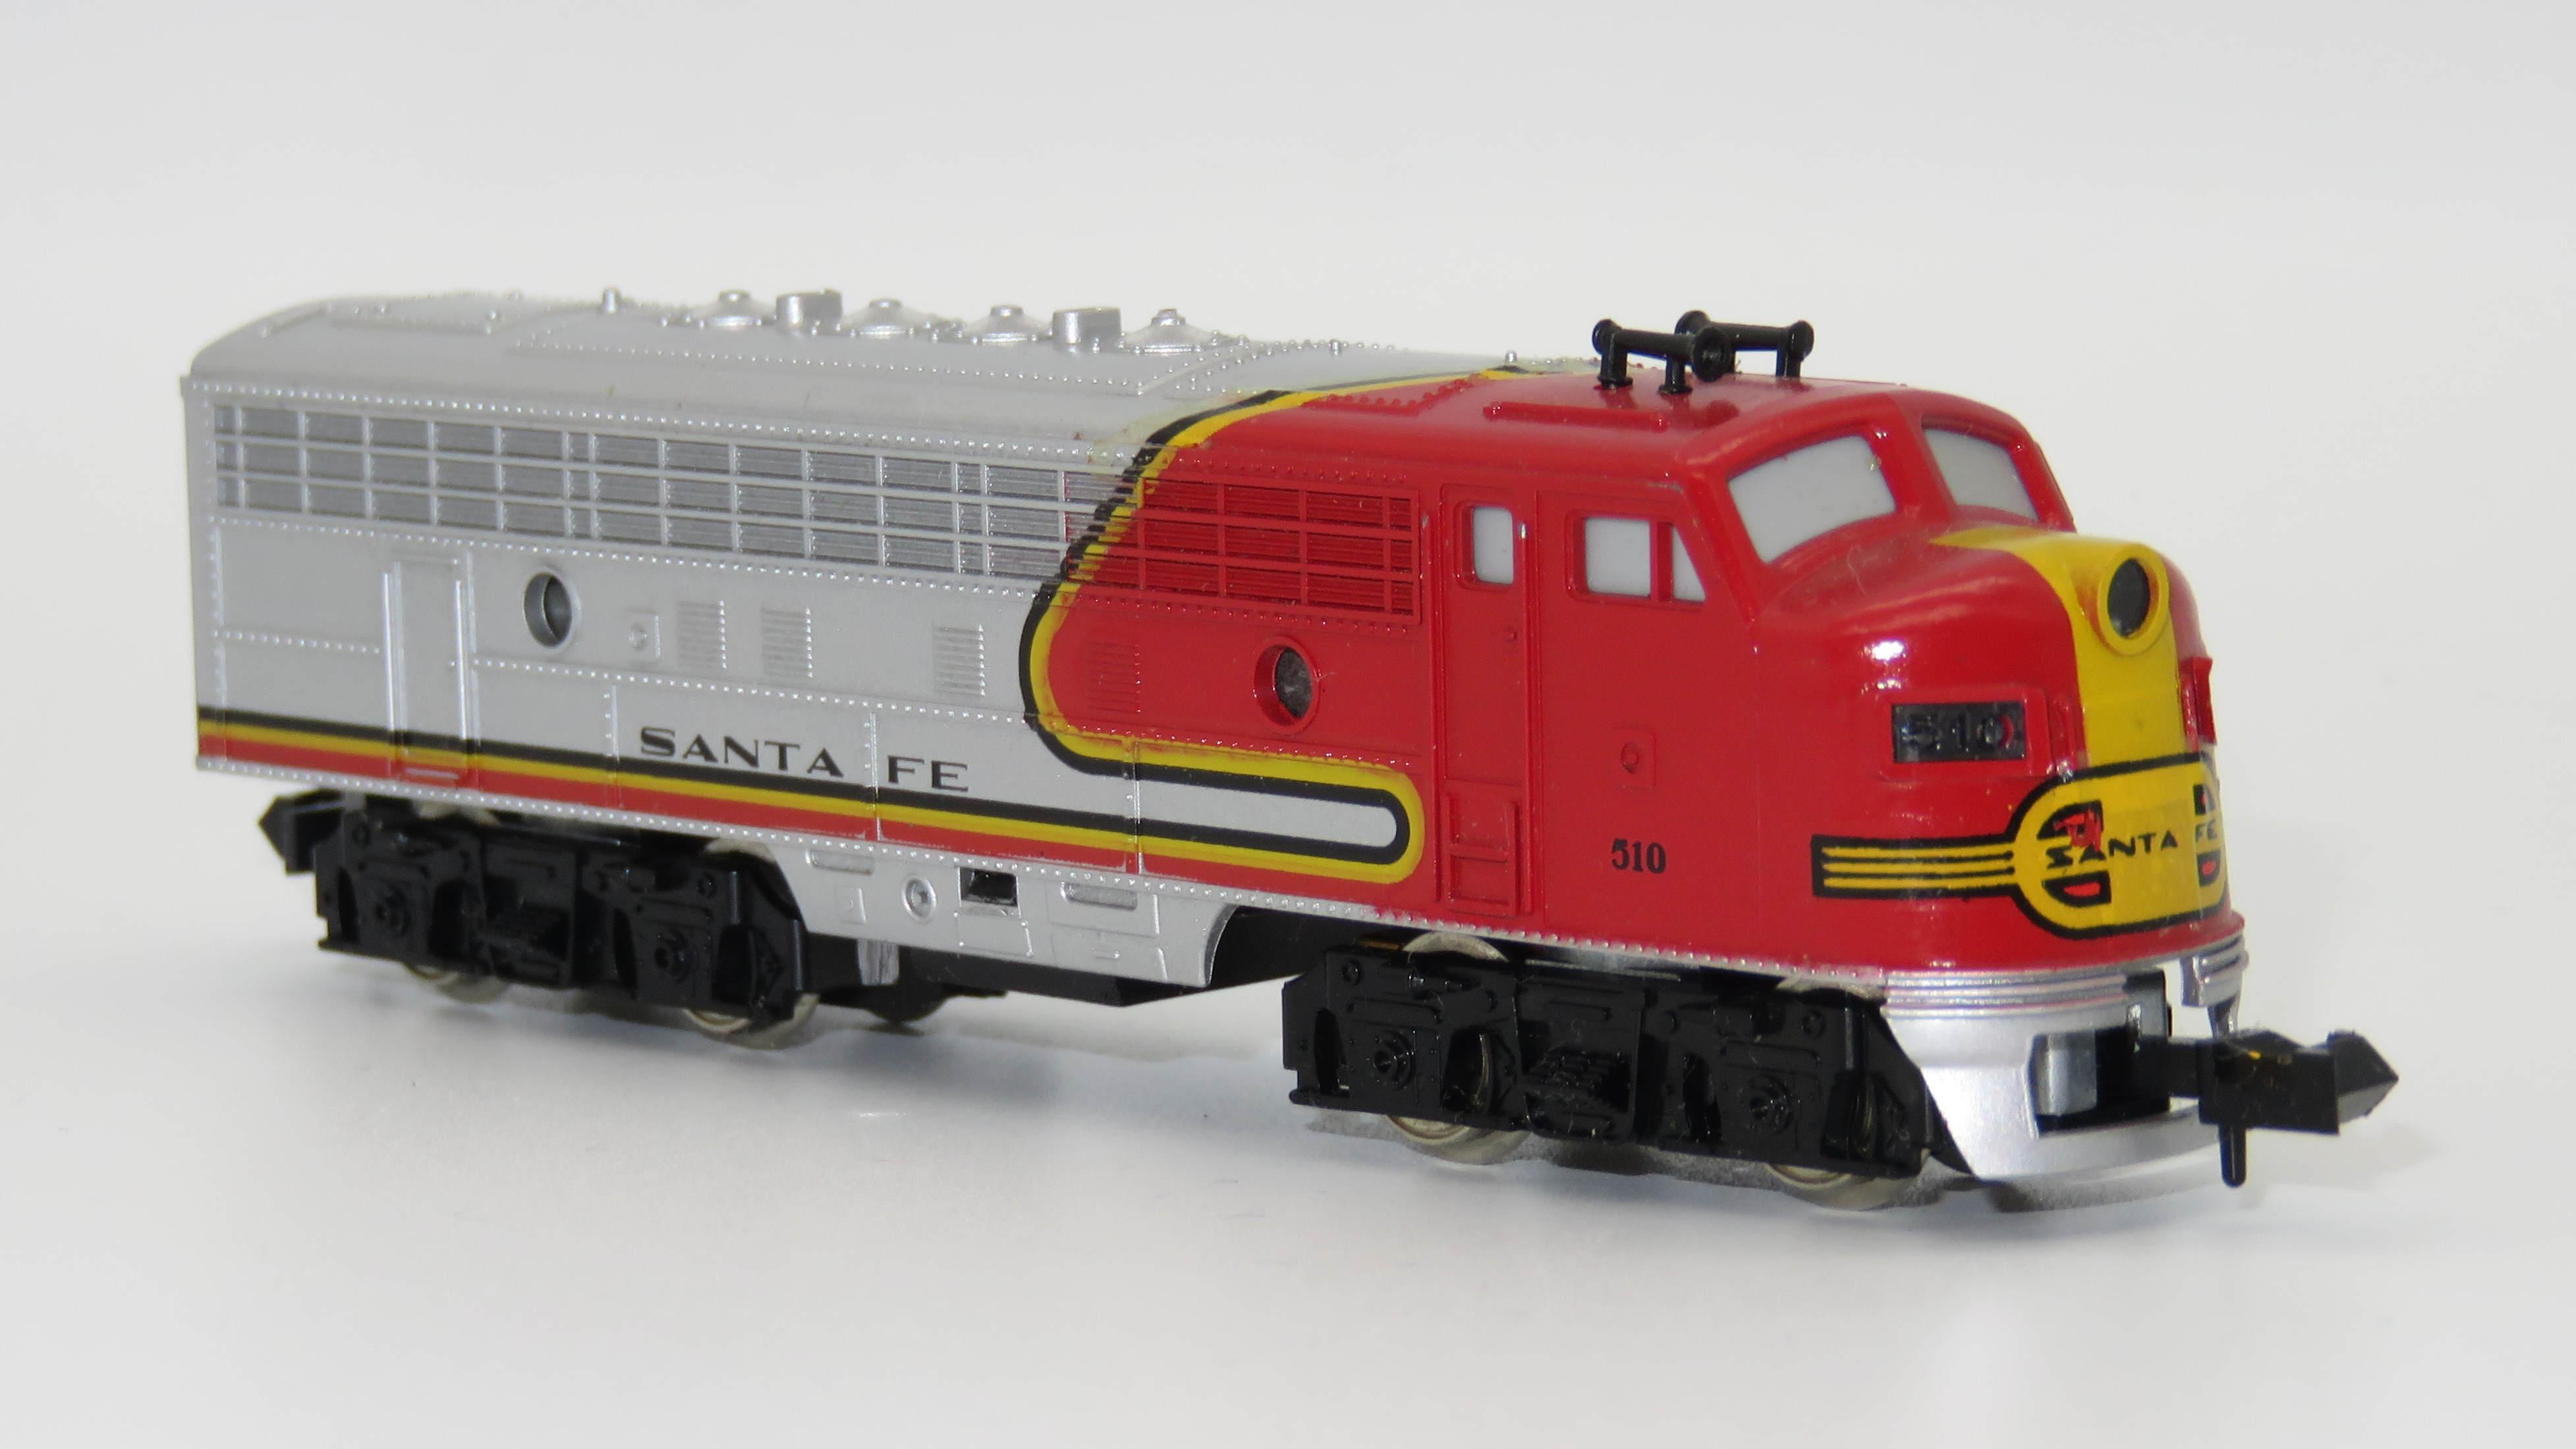 N Scale - Minitrix - 51295100 - Locomotive, Diesel, EMD F9 - Santa Fe - 510